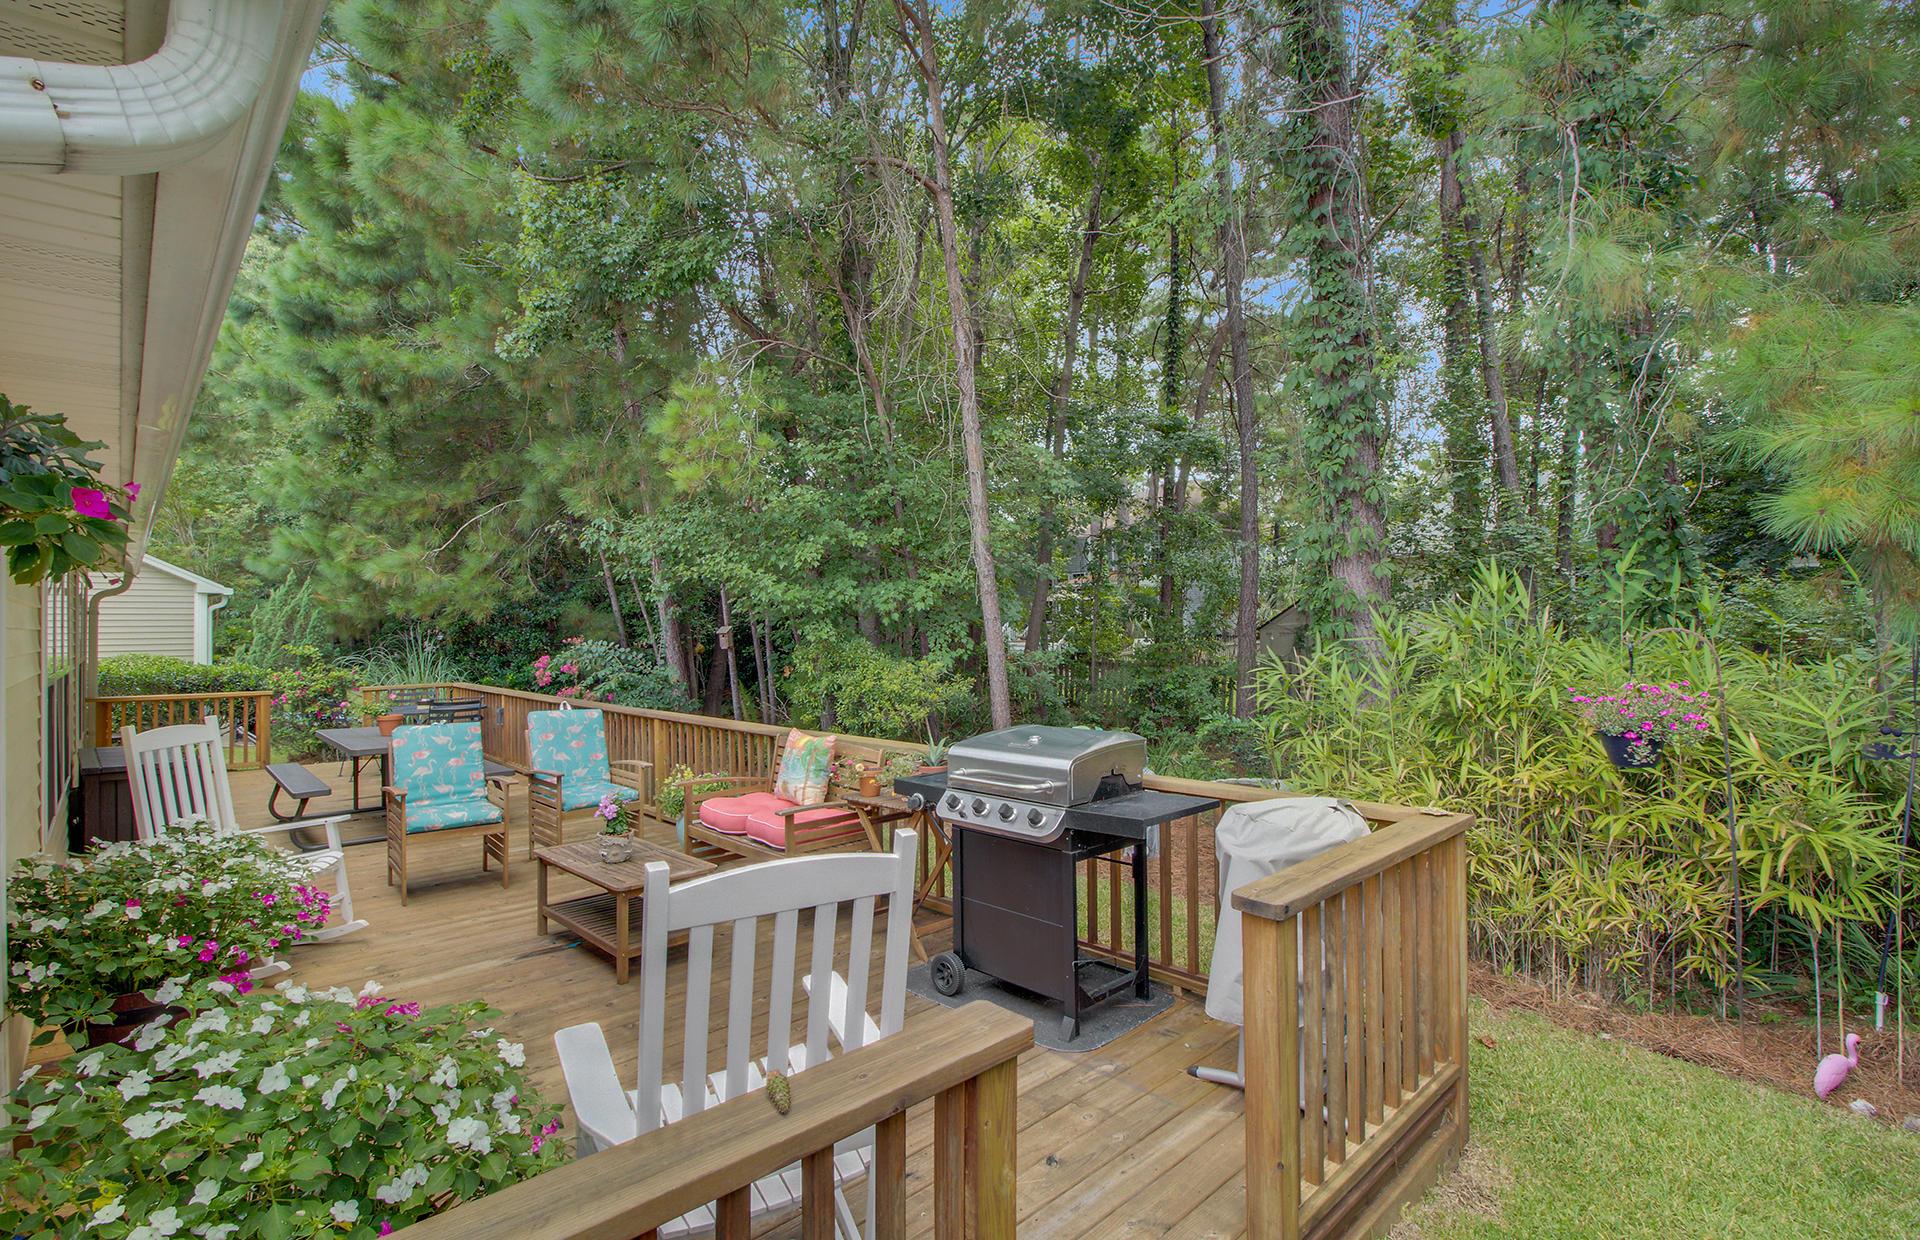 Park West Homes For Sale - 1500 Wellesley, Mount Pleasant, SC - 8